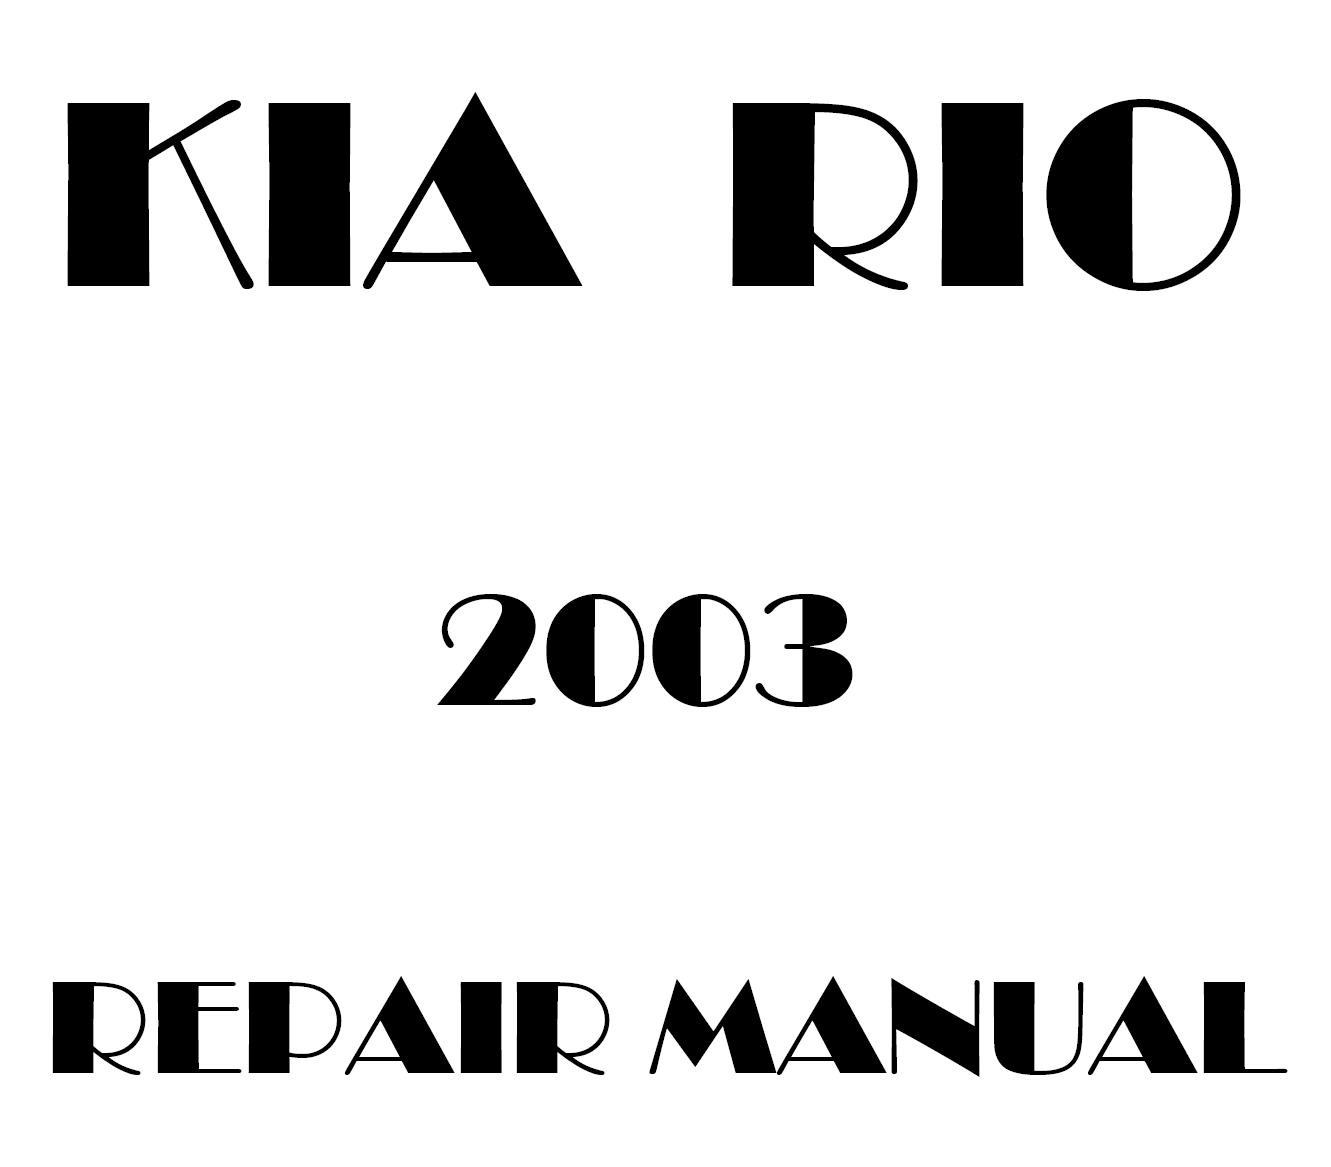 2003 Kia Rio repair manual